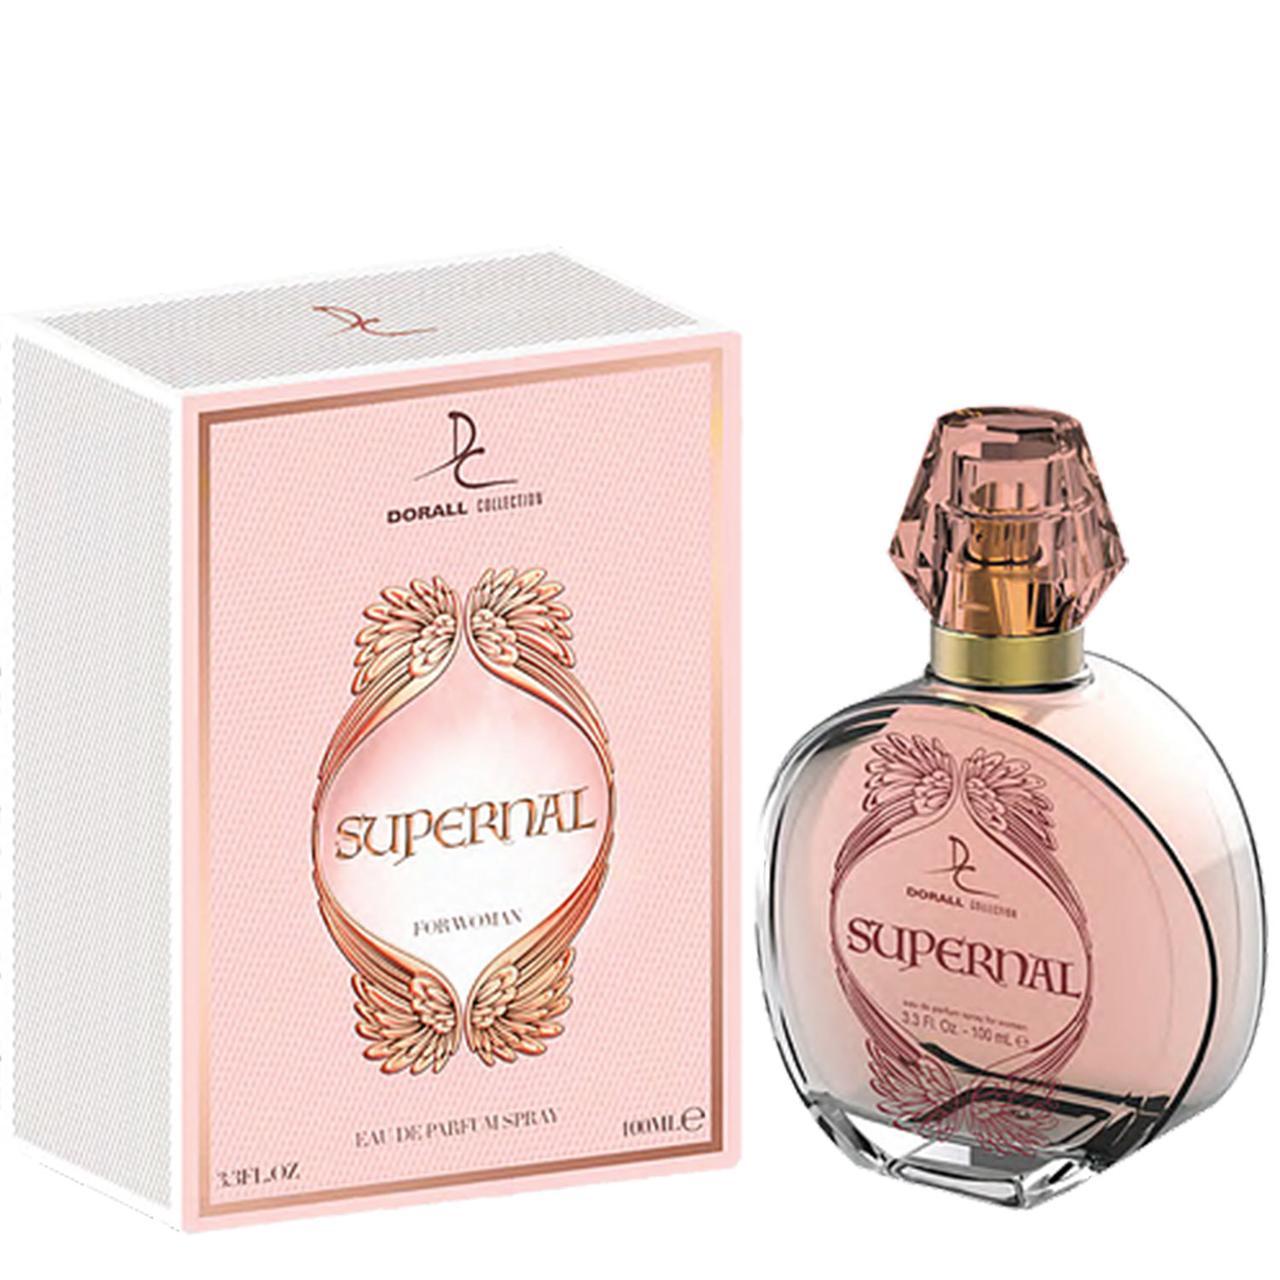 Dorall Collection - Supernal 100ml (женская парфюм. вода) /версия P.Rabanne Olympea/